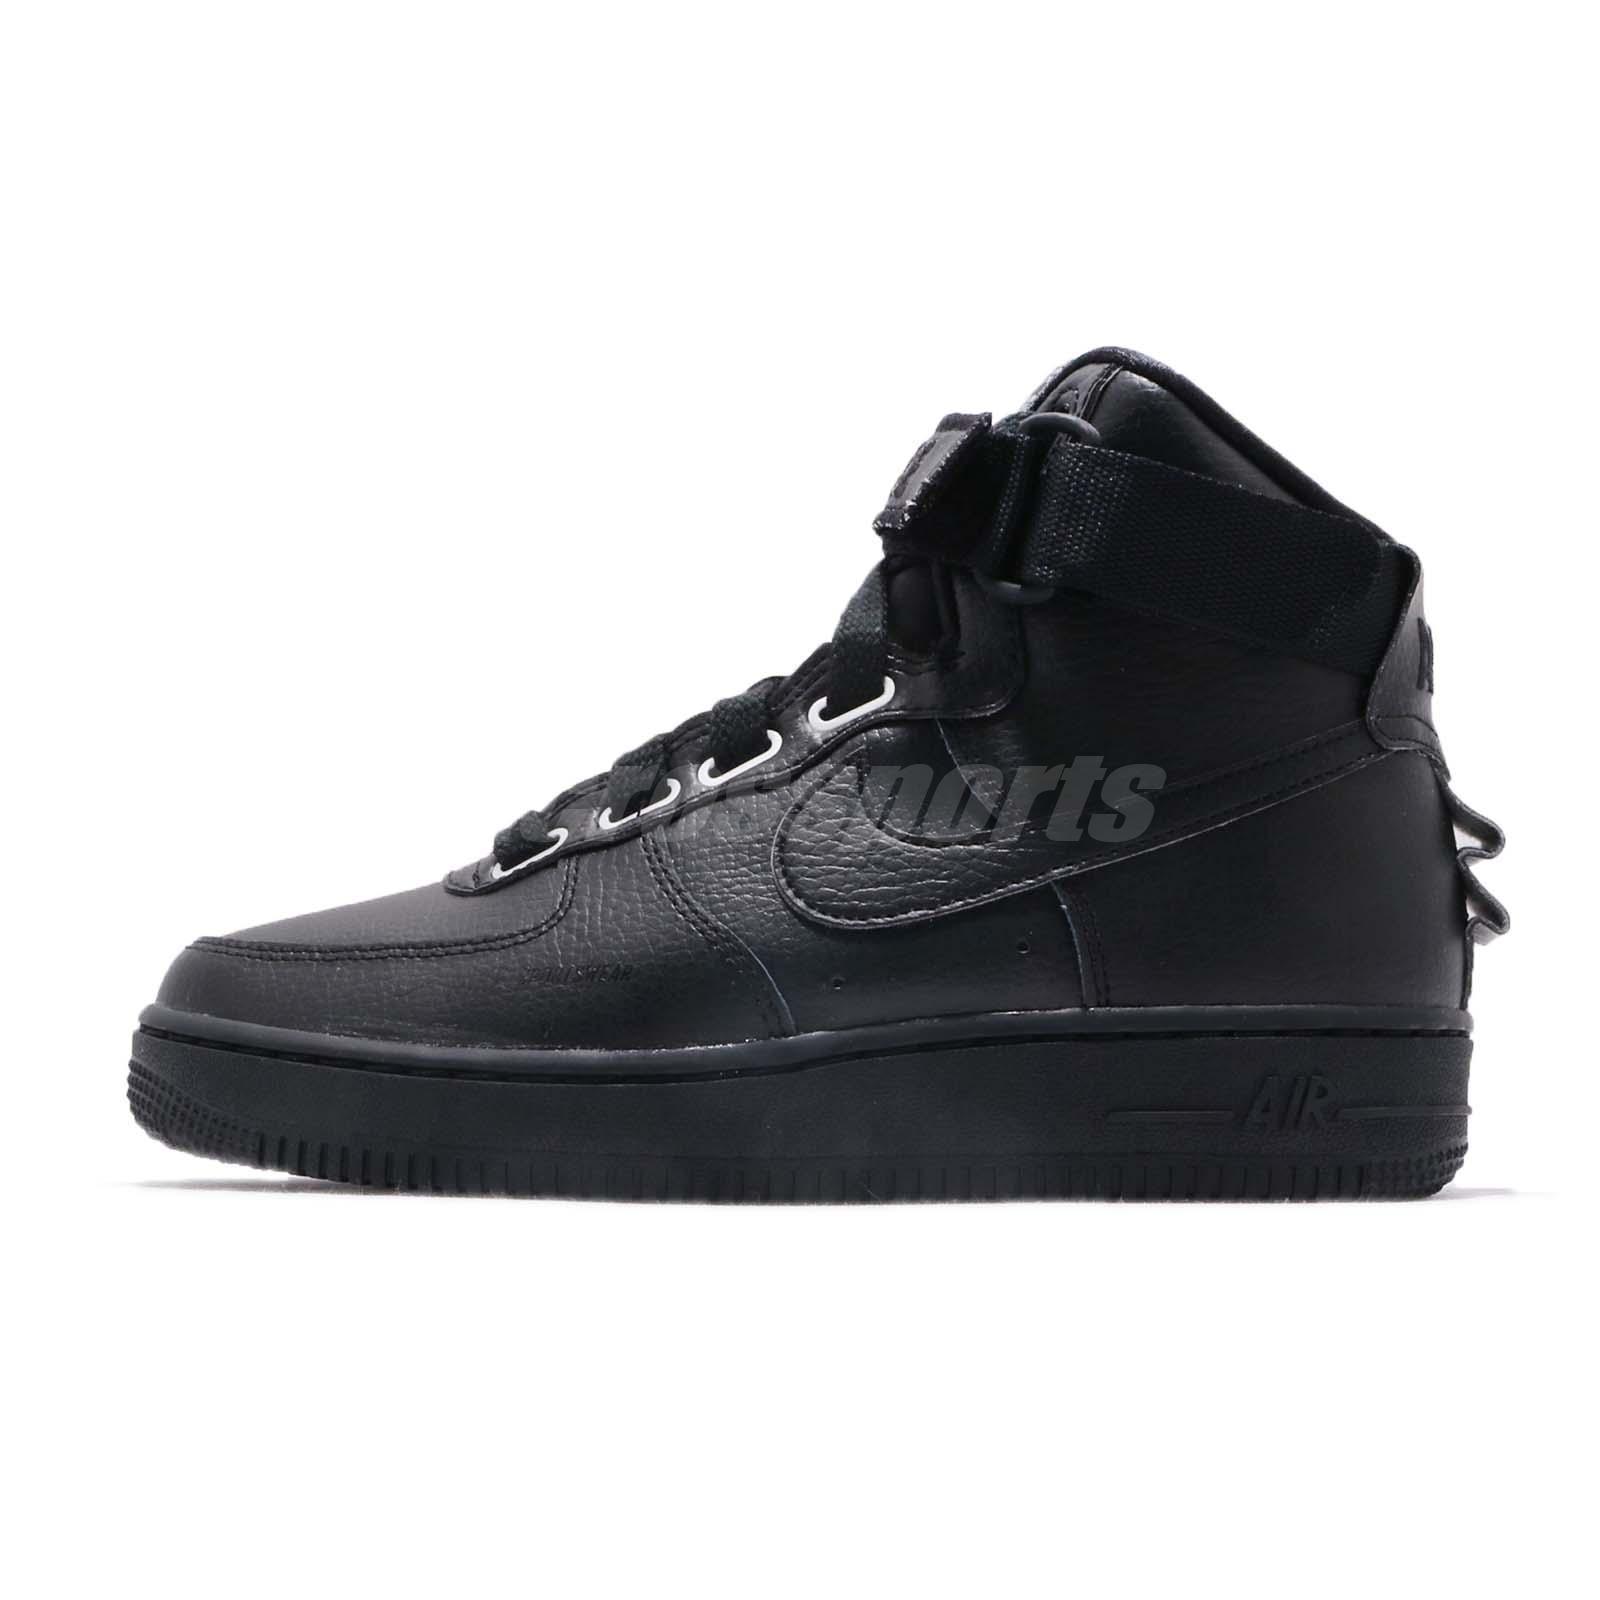 sports shoes 6290b 14e0b Nike Wmns AF1 Hi UT Air Force 1 Utility Black Womens Shoes Sneakers AJ7311 -001